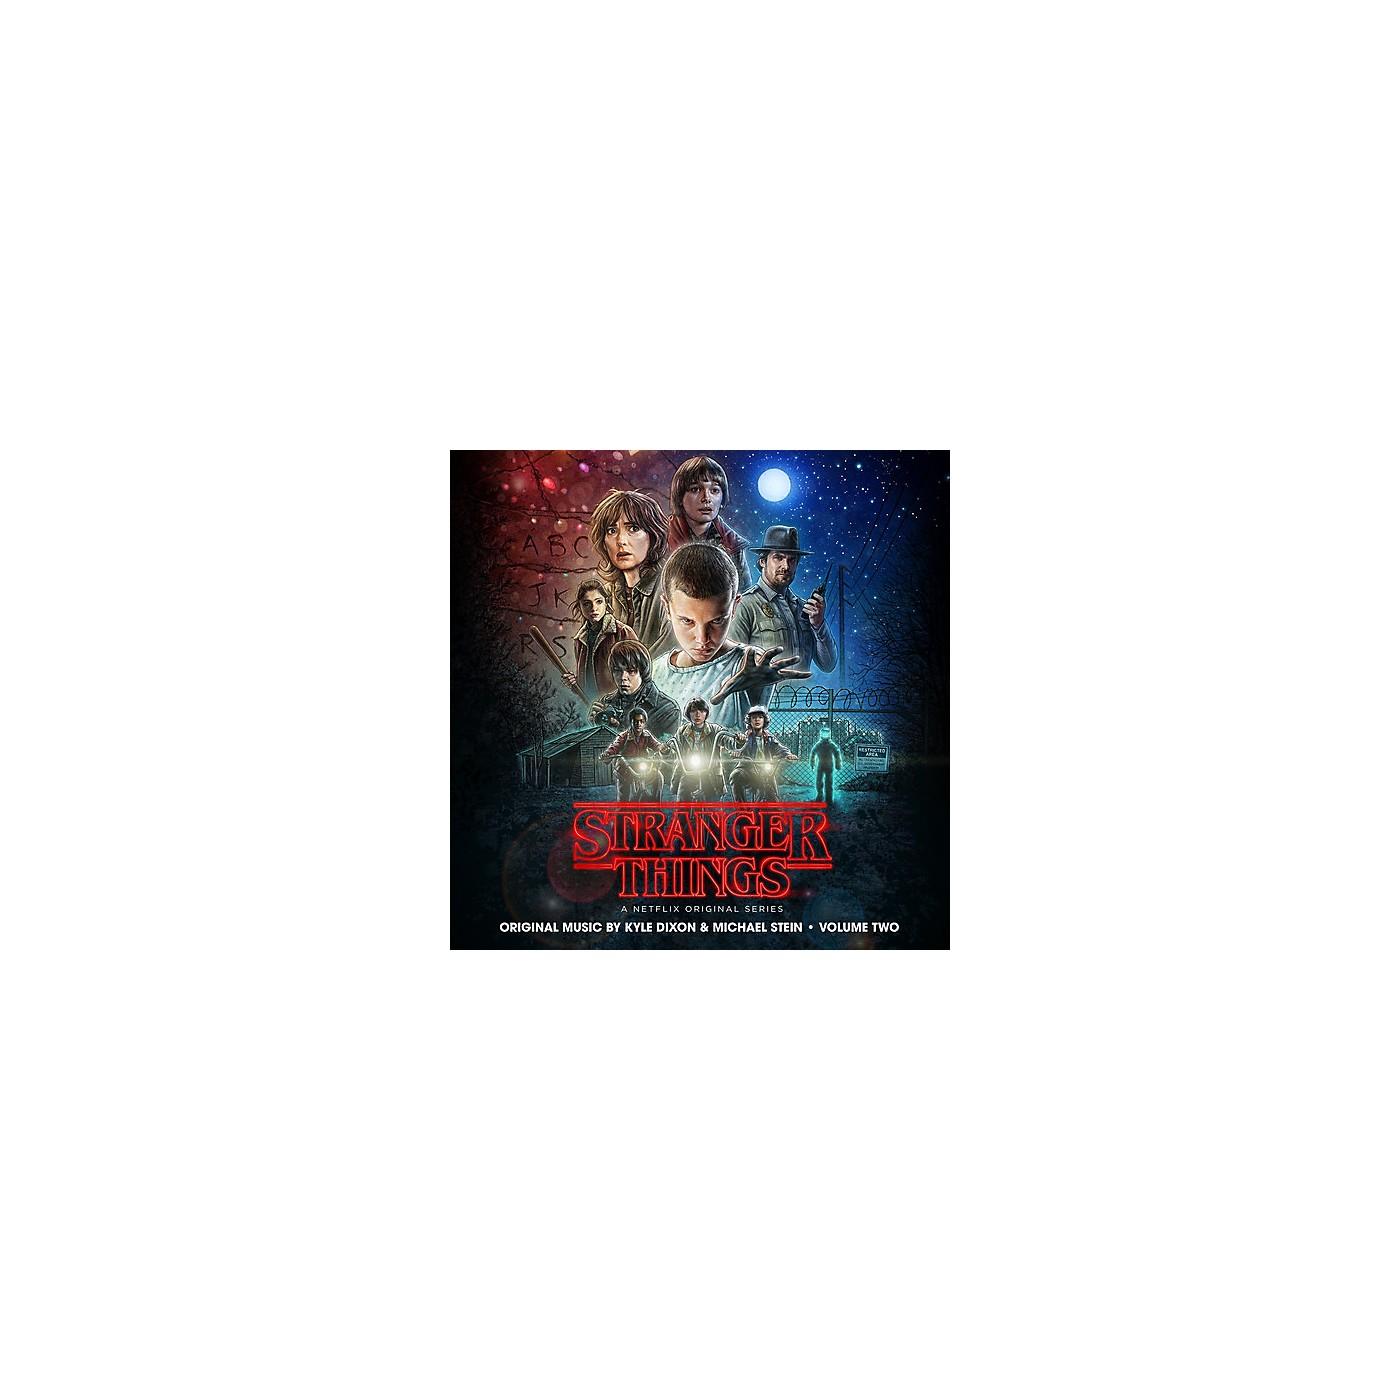 Alliance Stranger Things vol. 2 (netflix Original Series Soundtrack) thumbnail